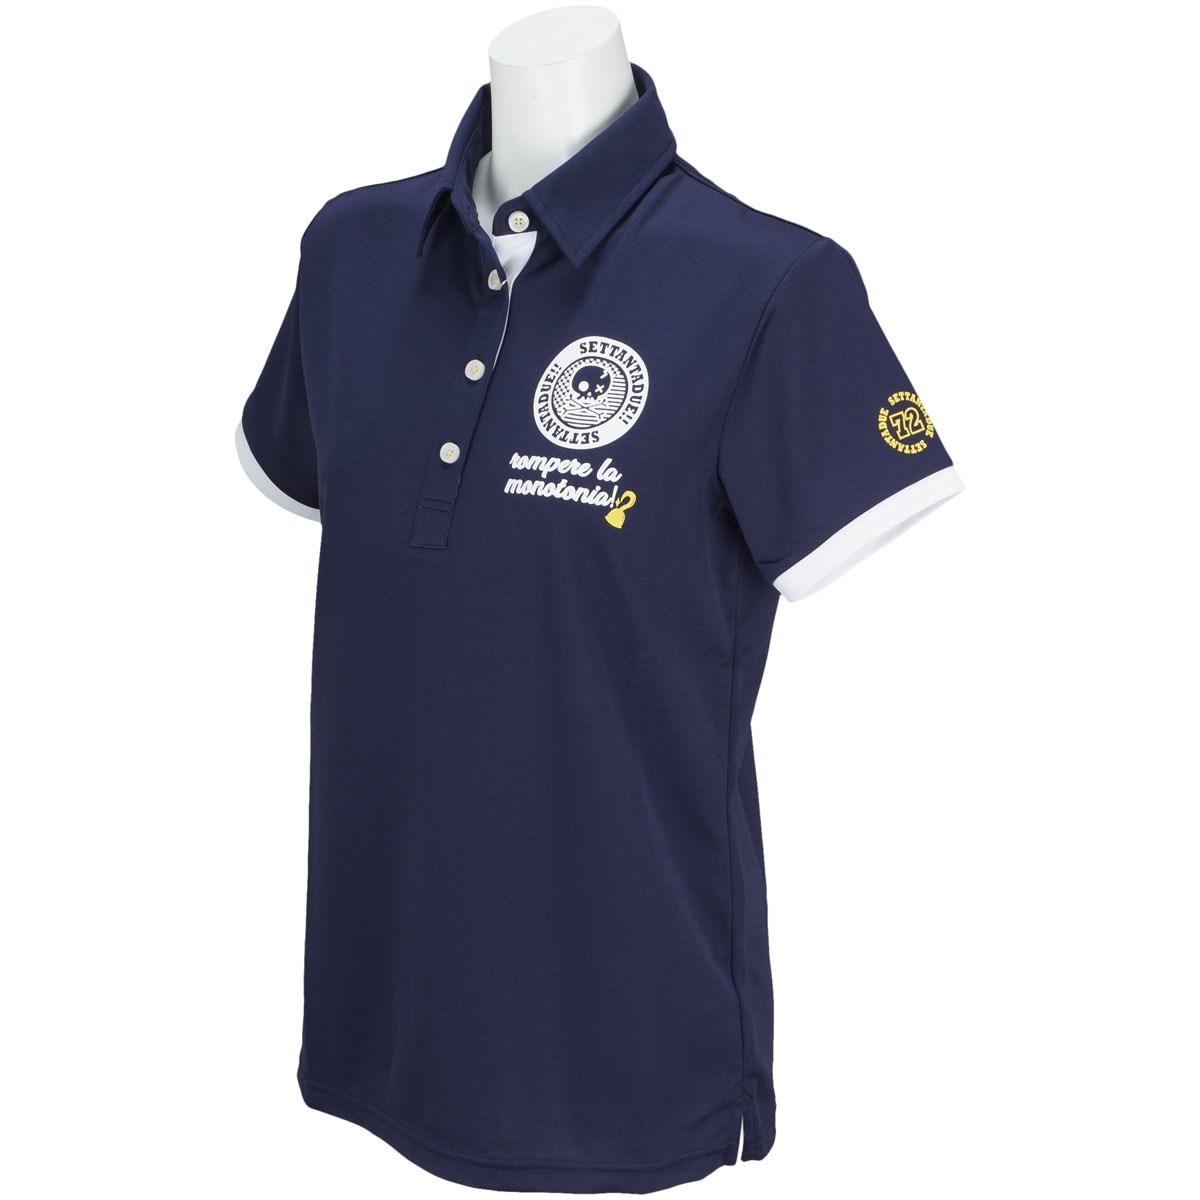 PAR72 パー72 半袖ポロシャツ S ネイビー レディス